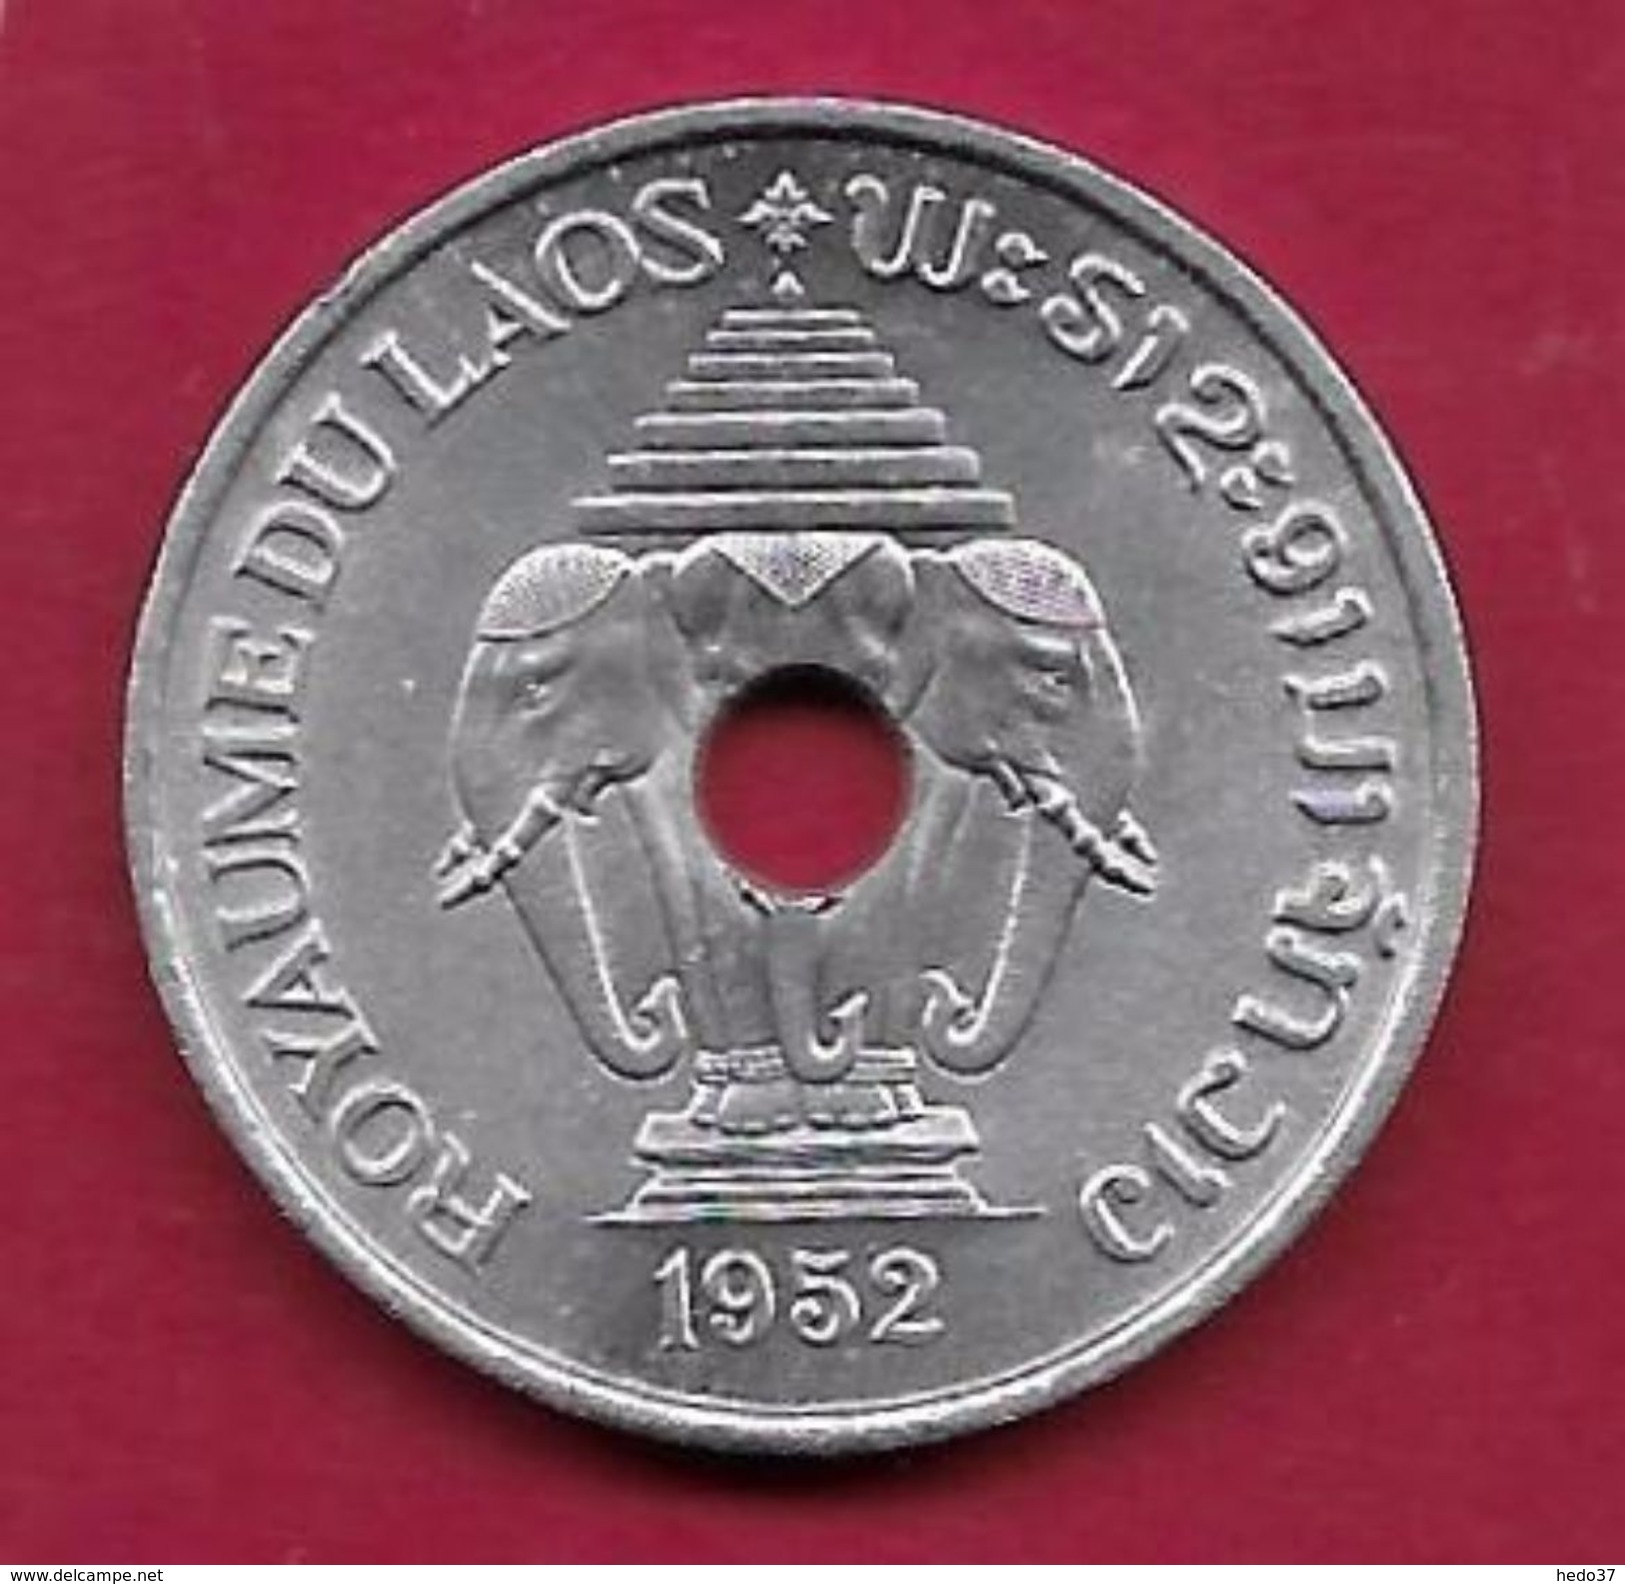 Laos - 20 Cents -1952 - Laos